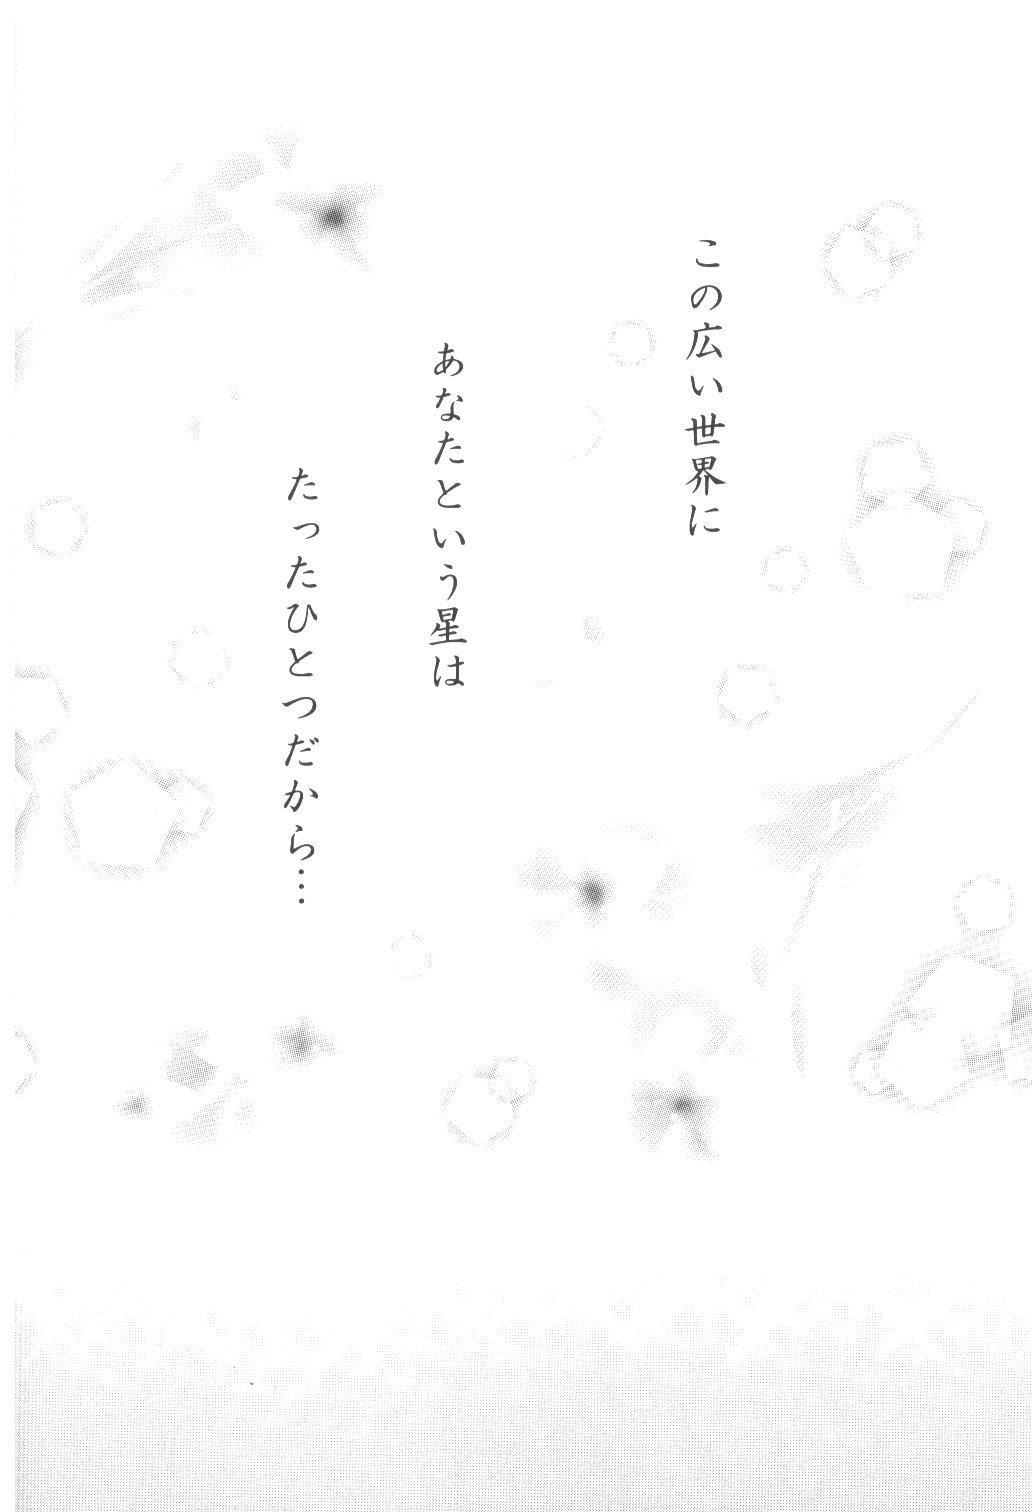 Ryuusei Ryodan 49